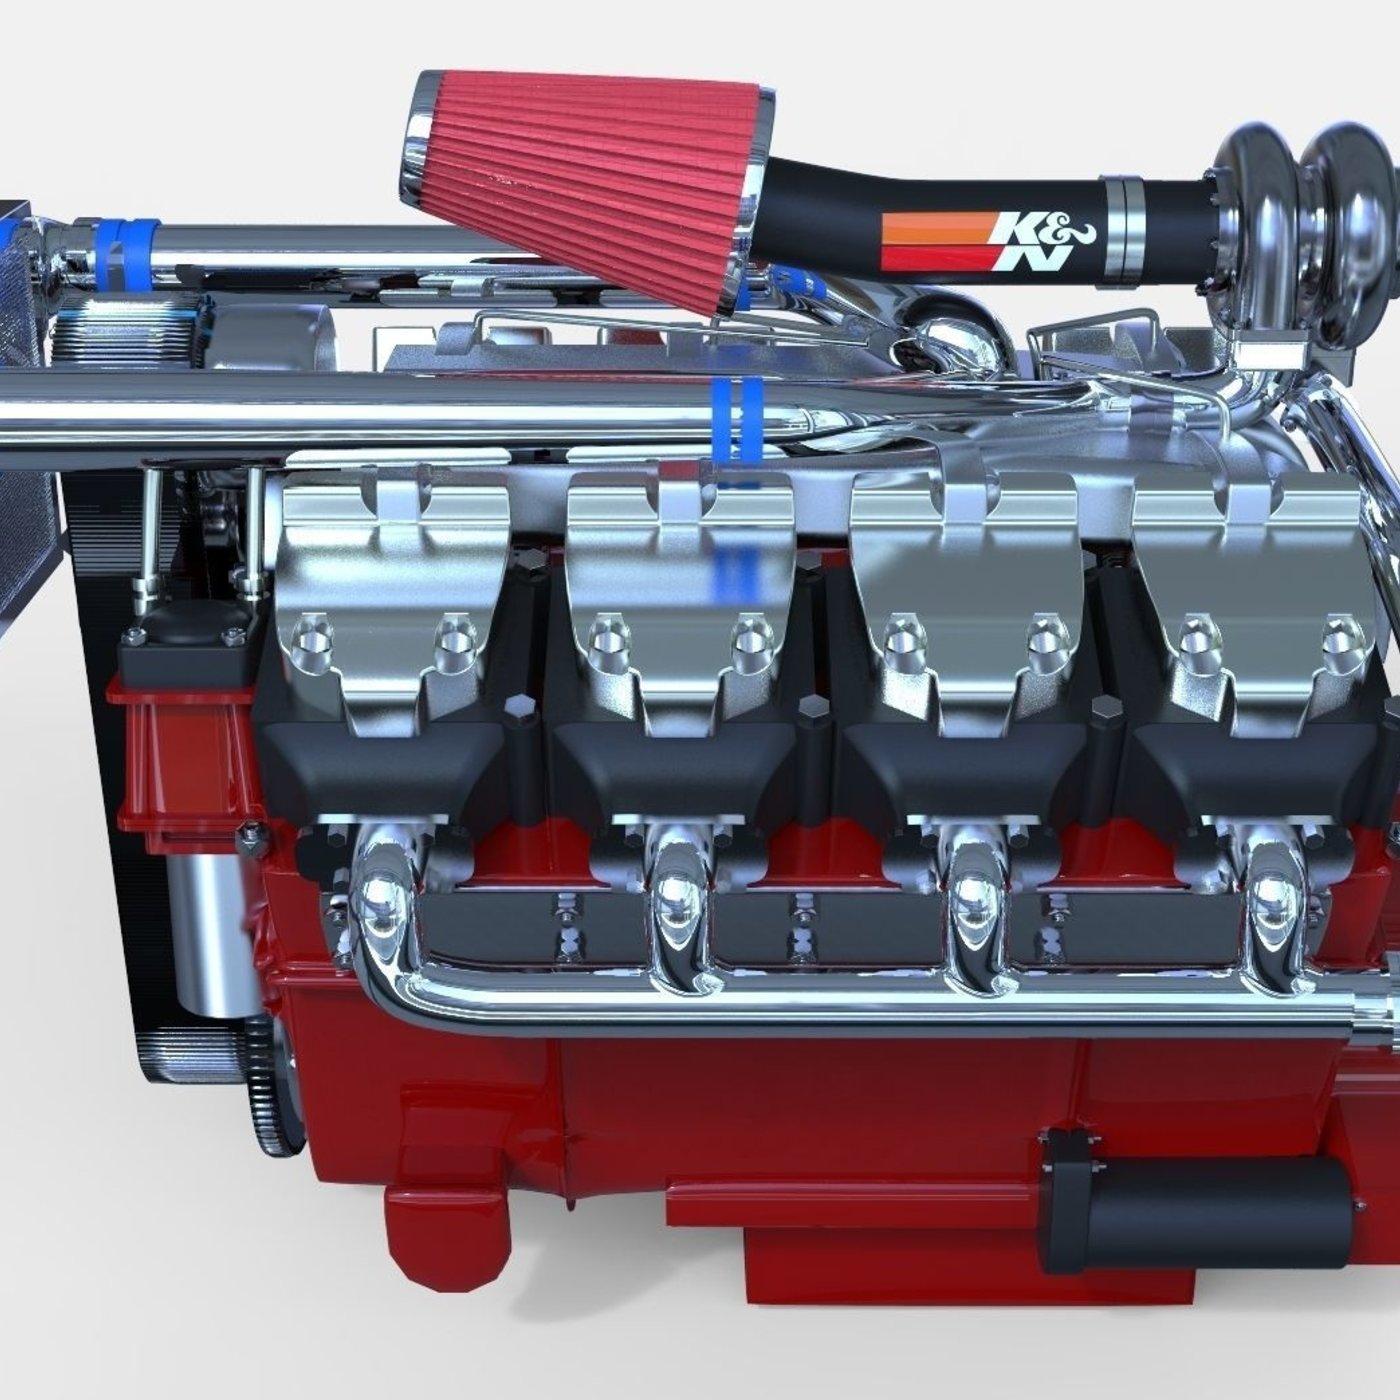 V8 TurboDiesel Modeled in Rhino 5!